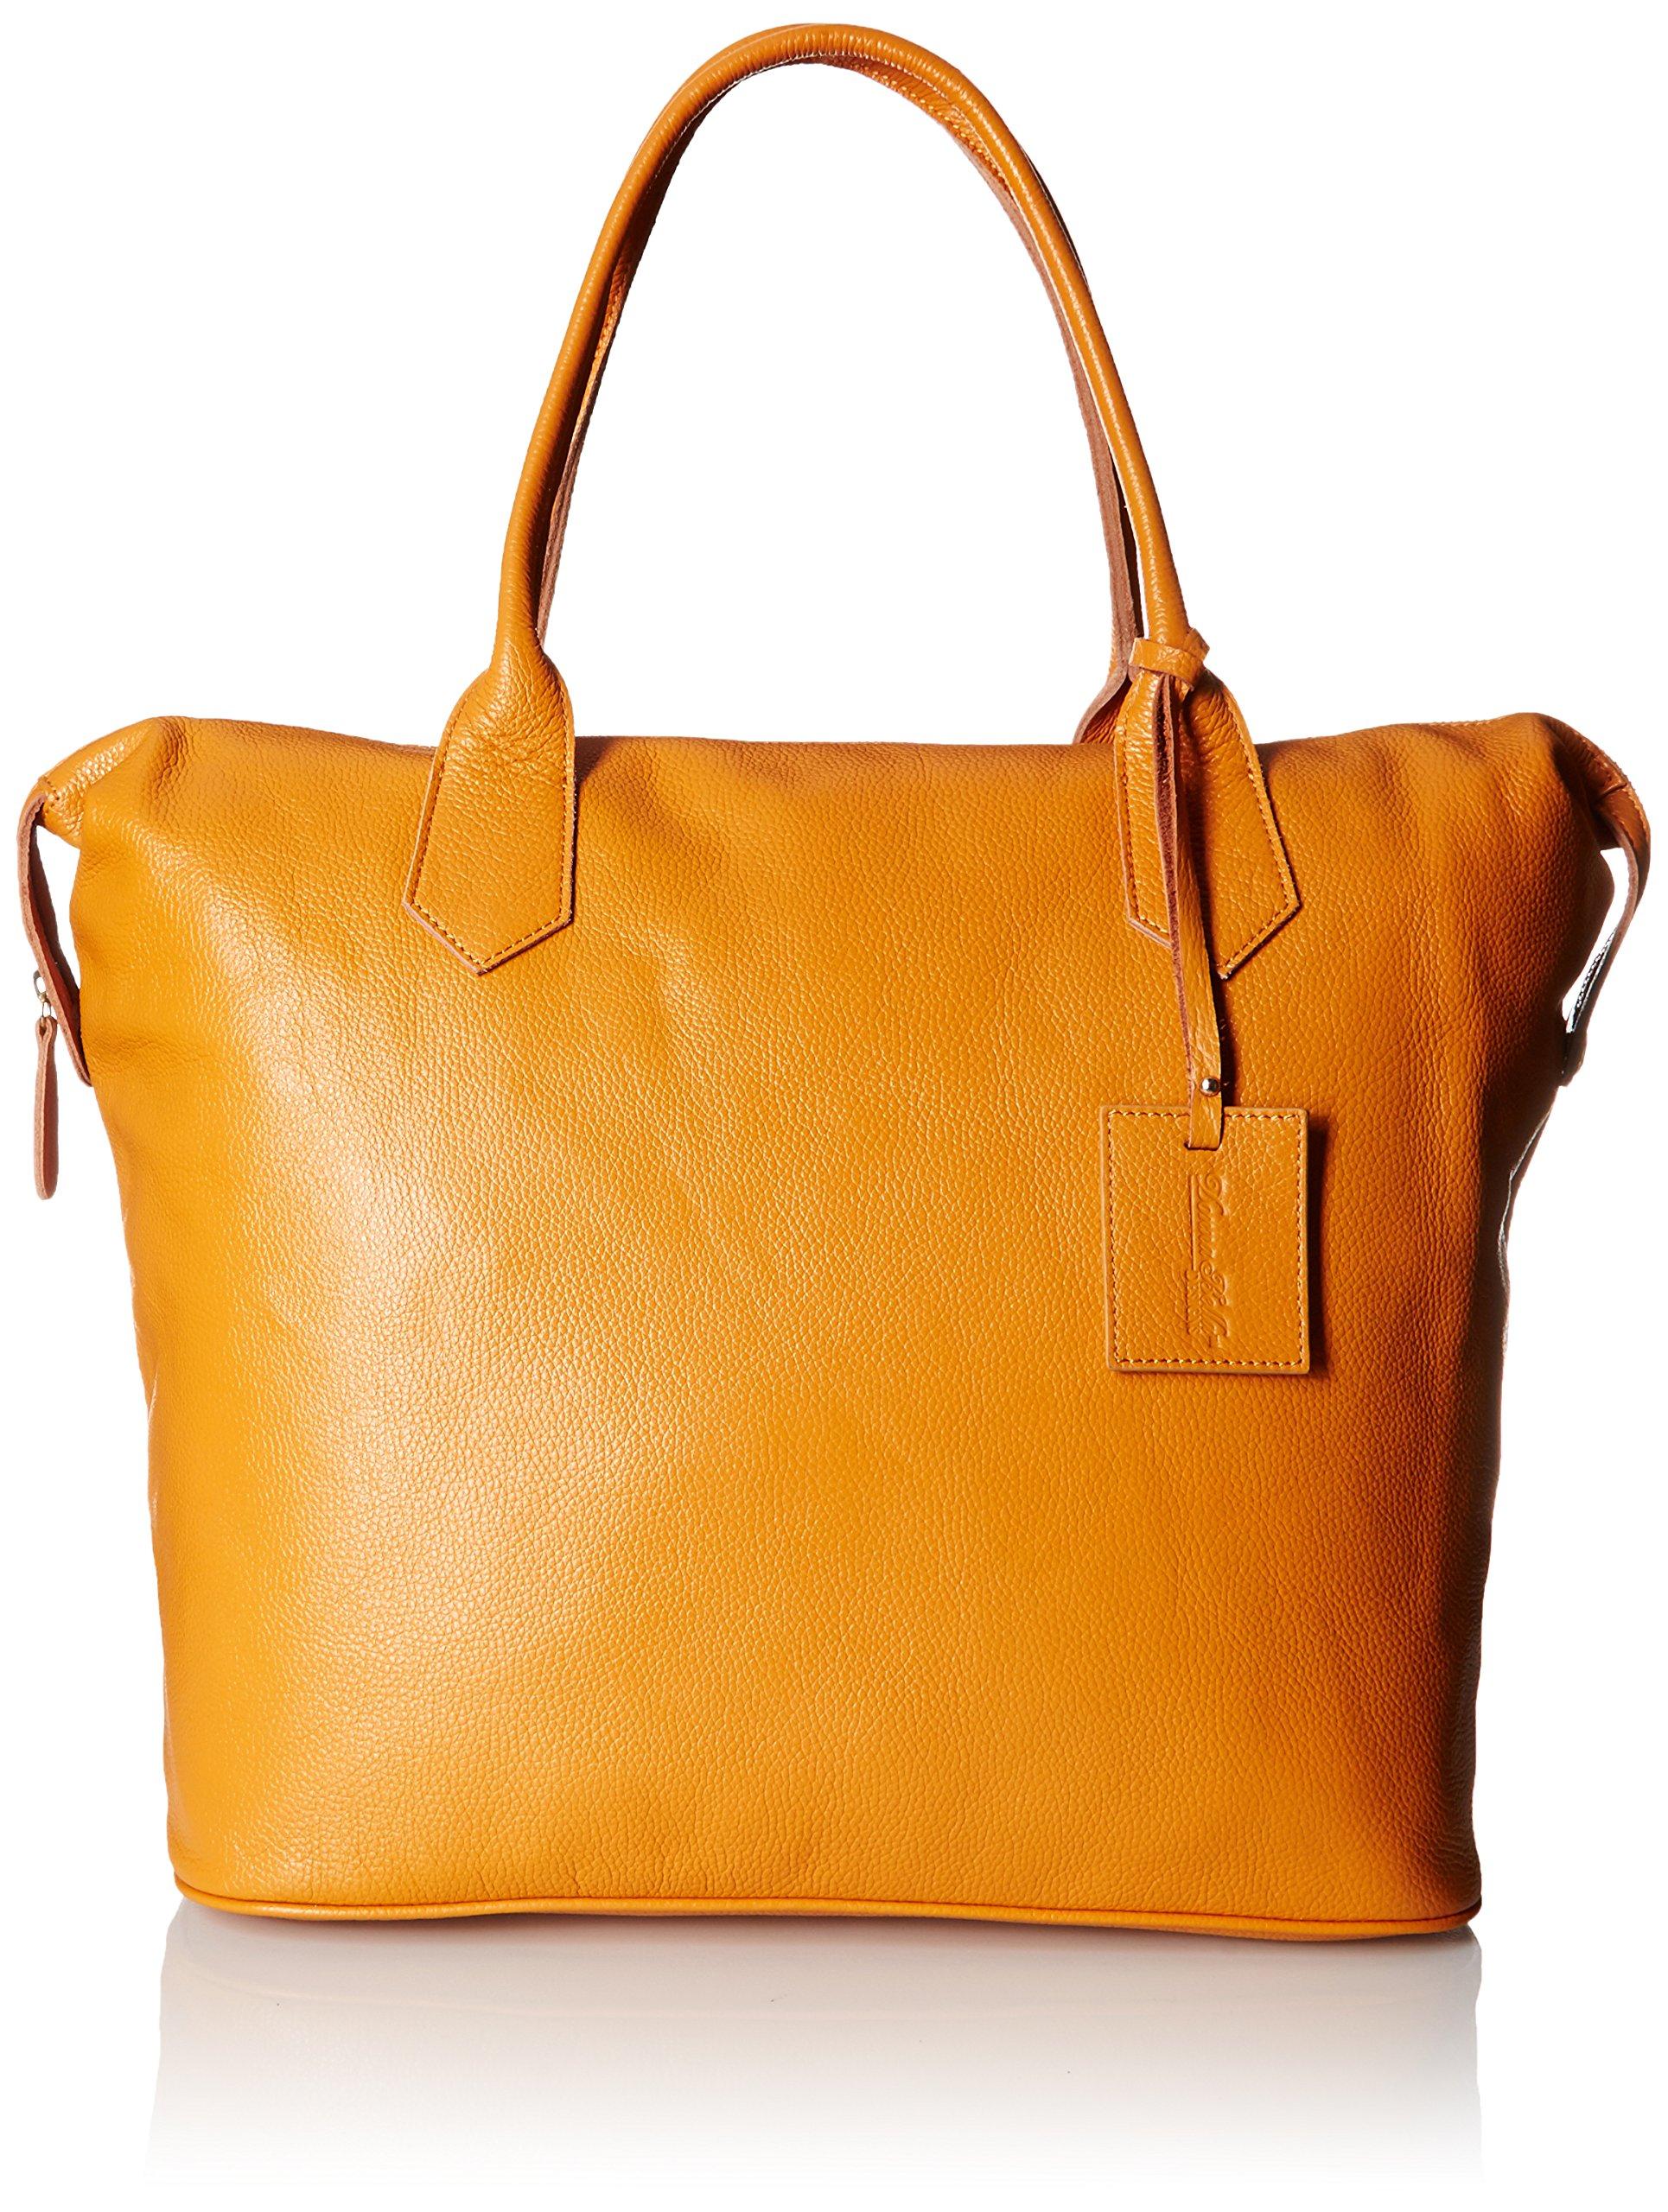 Donna Bella Designs Heron Leather Weekend Bag, Yellow